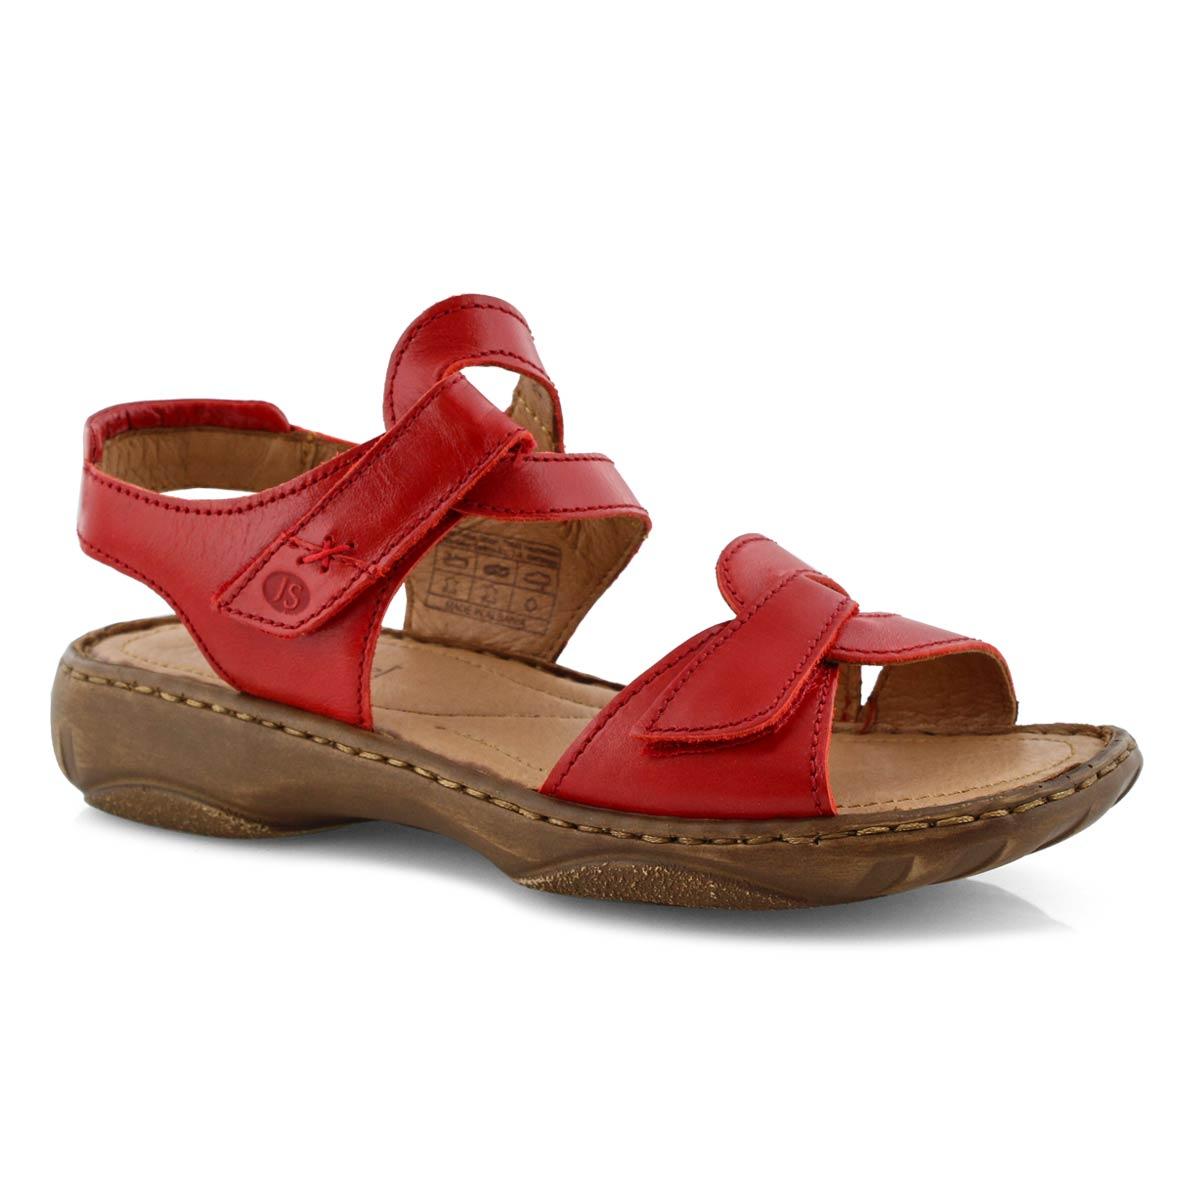 Lds Debra 39 rubin casual 2 strap sandal